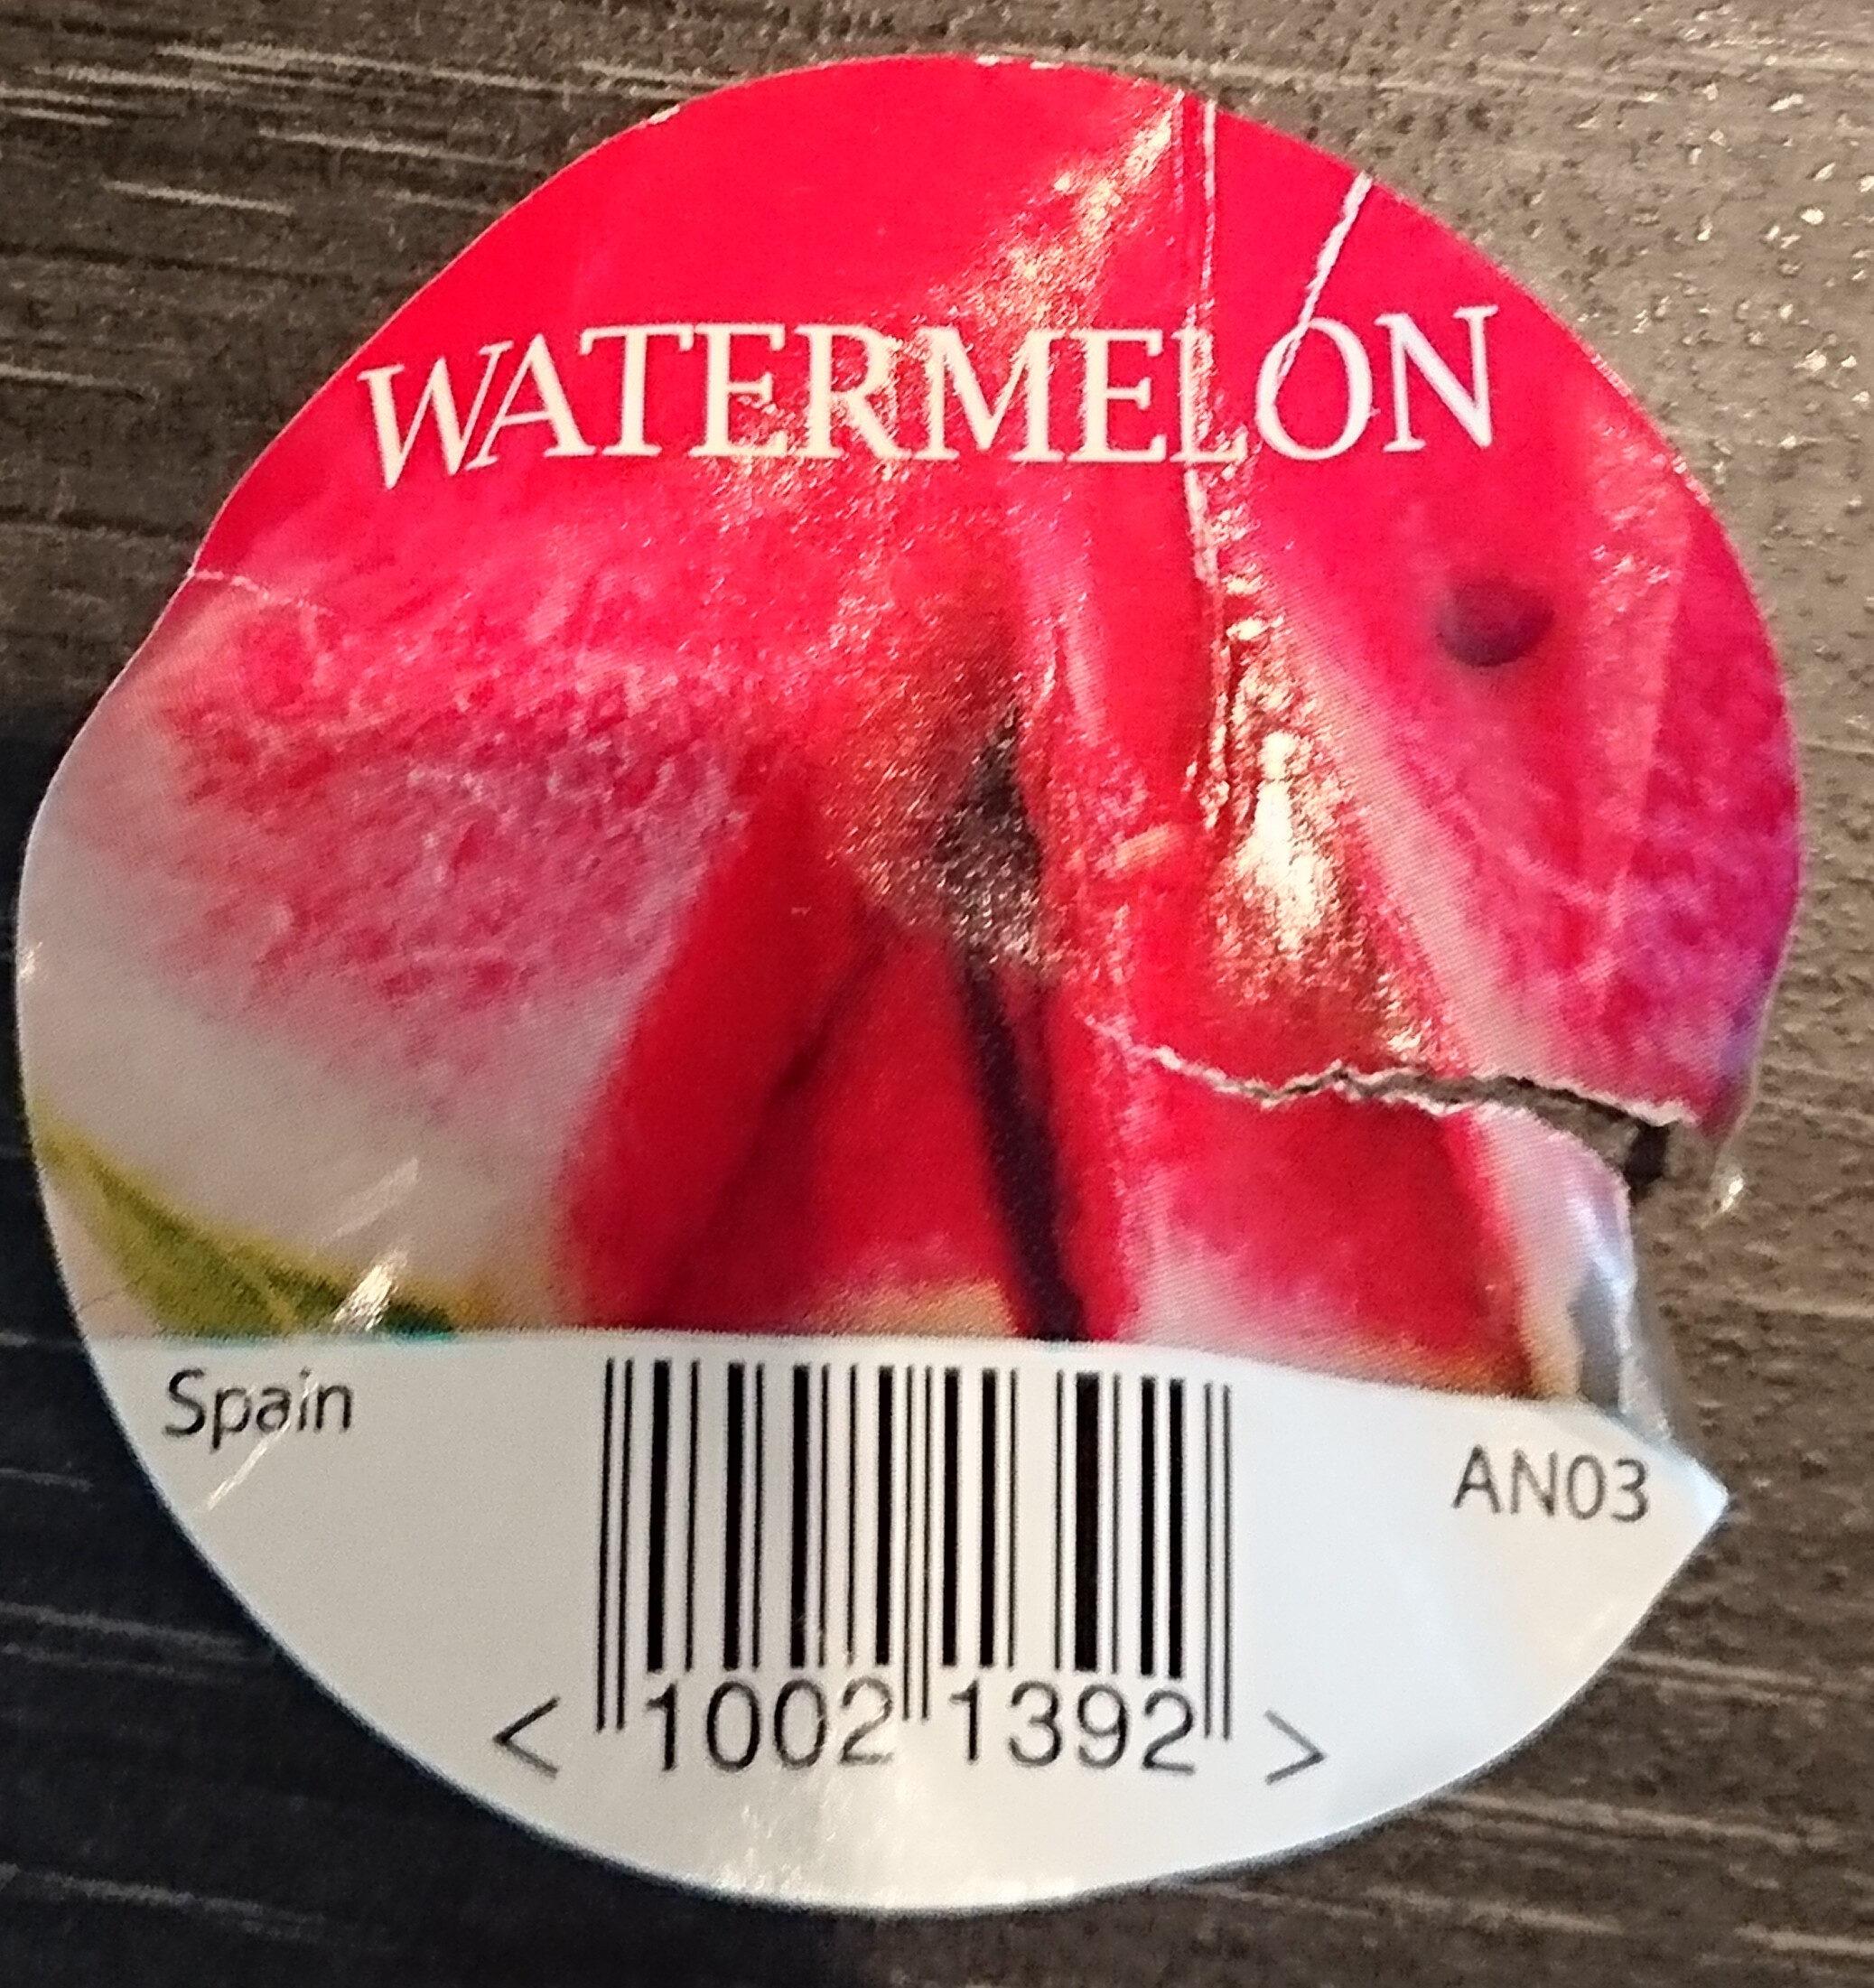 Watermelon - Ingredients